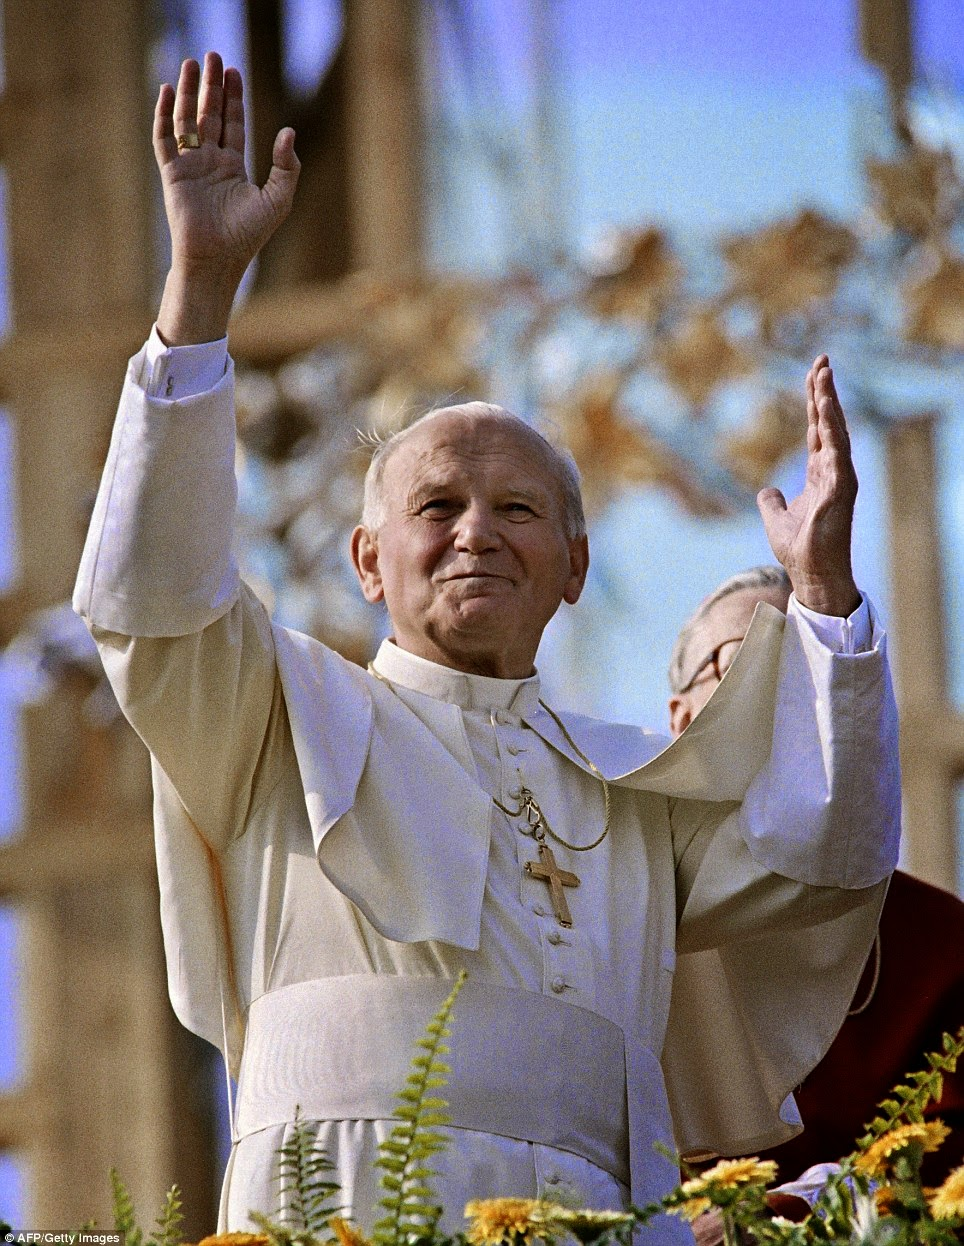 Doctoral thesis of pope john paul ii